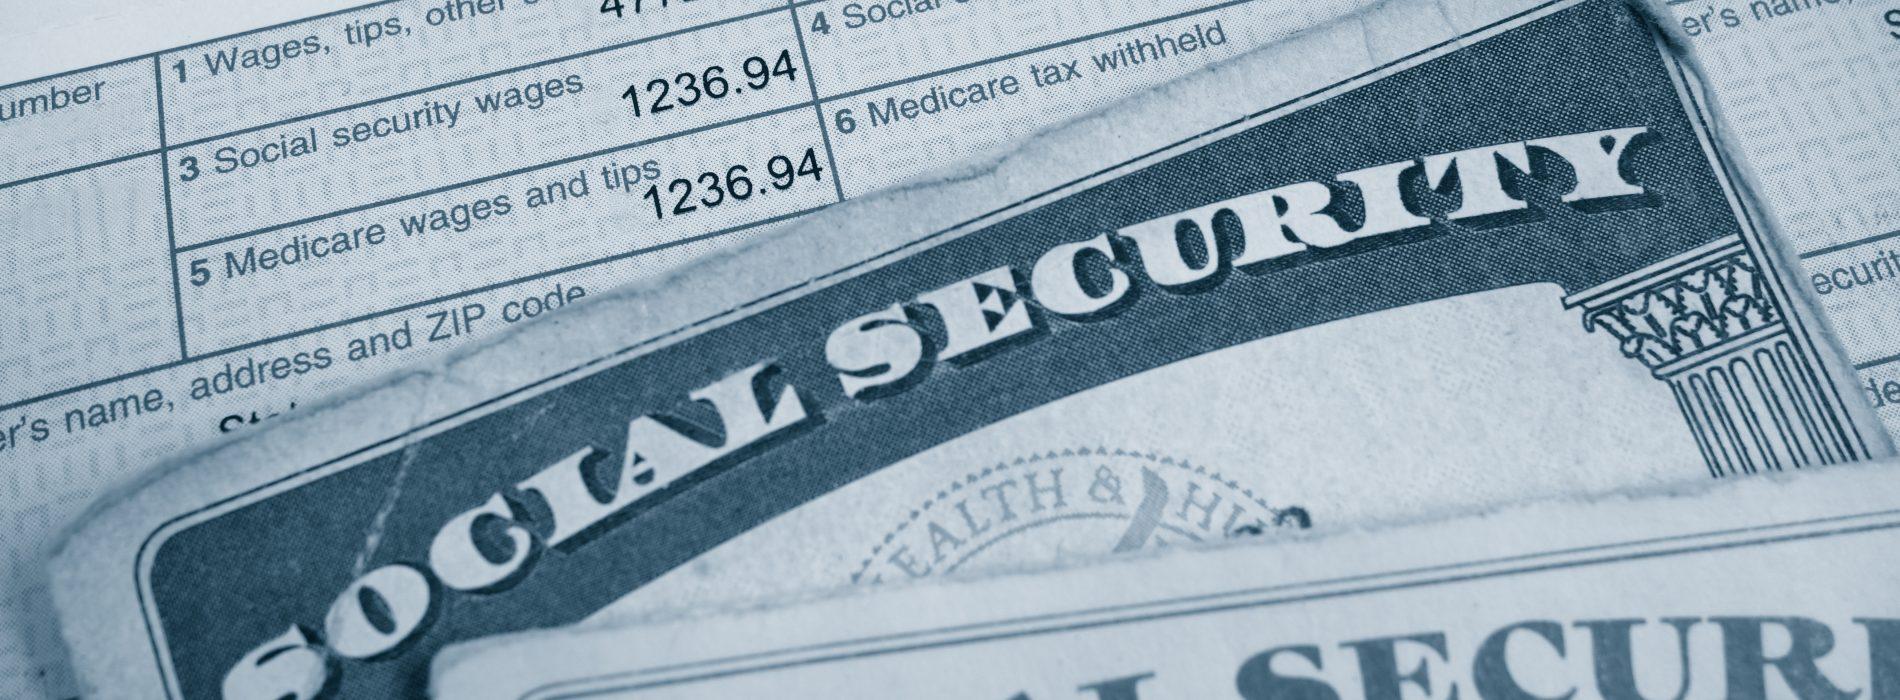 Spousal Social Security Benefits